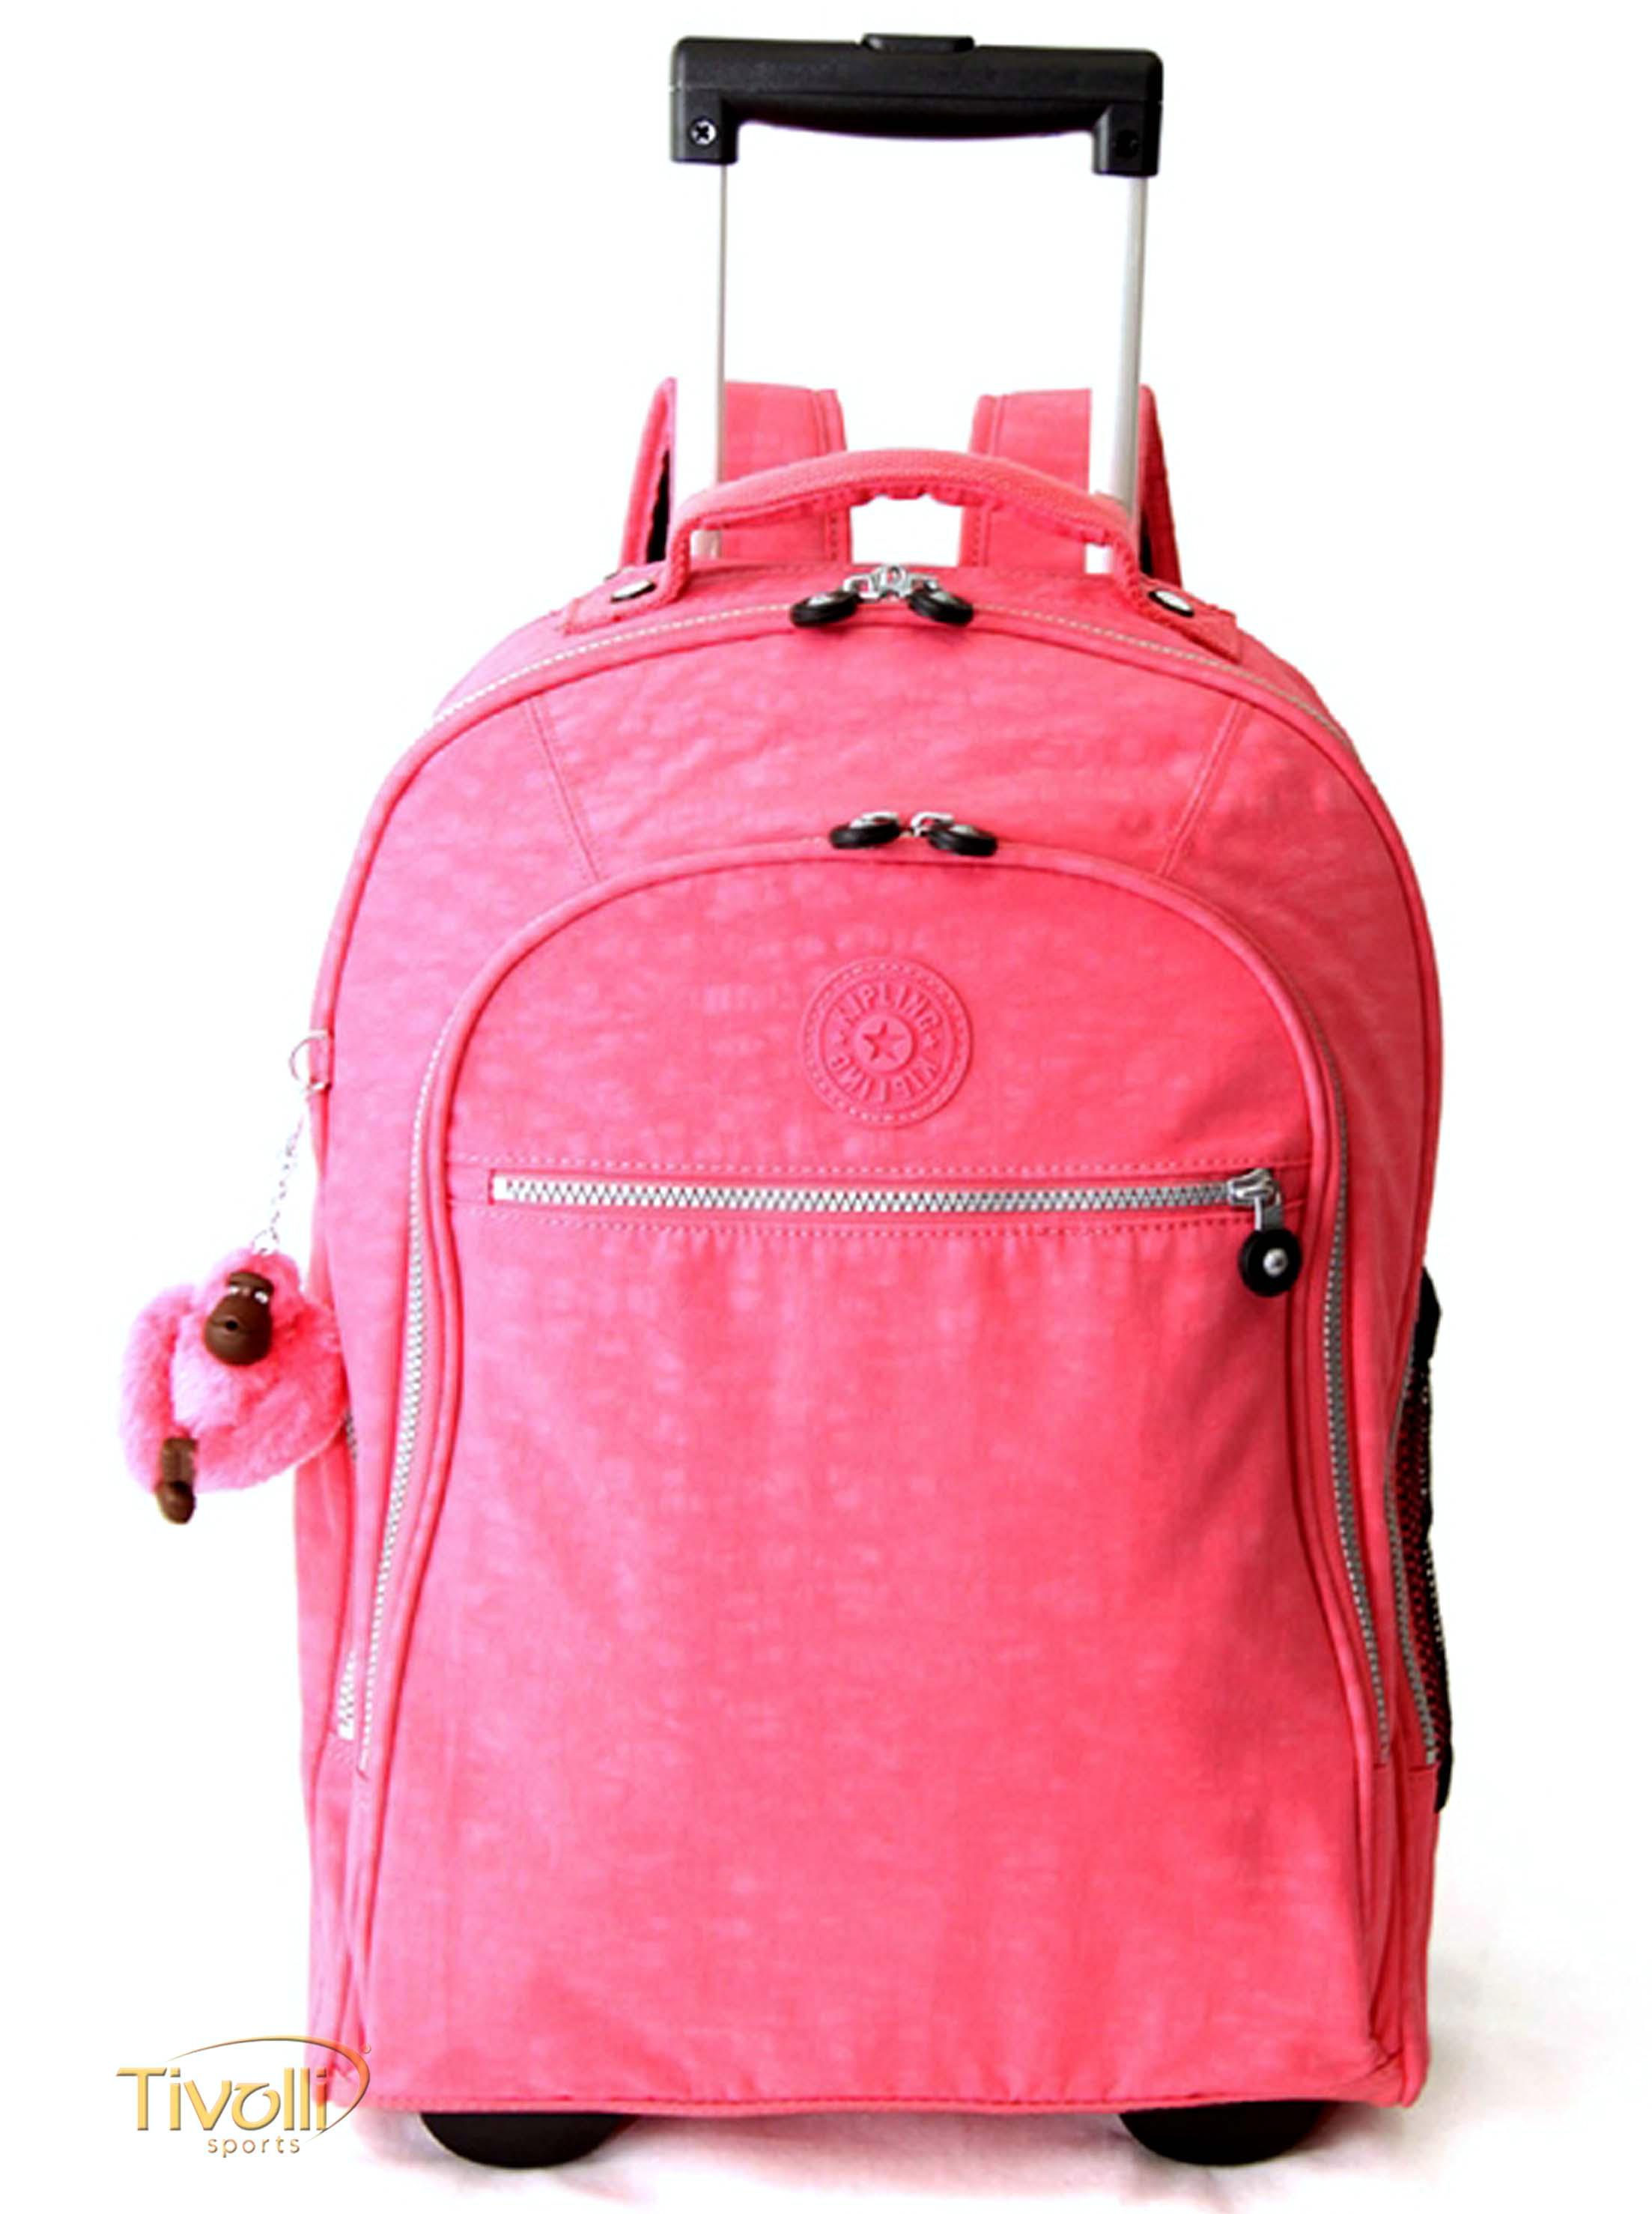 614df6302 Mochila Kipling Uttara com rodinhas > Pink >